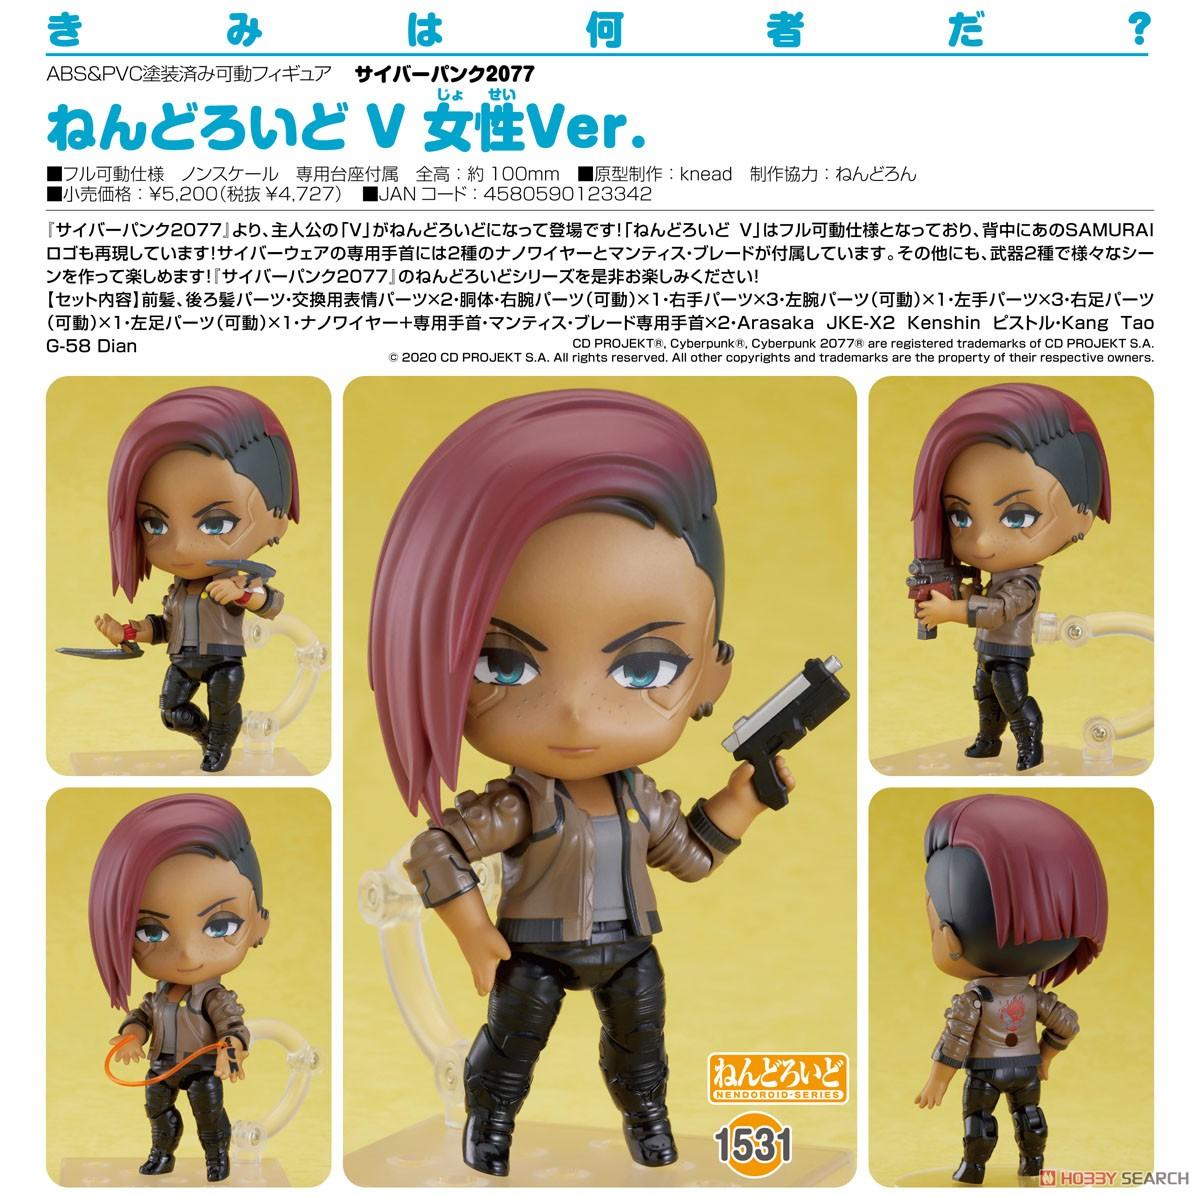 Nendoroid Cyberpunk 2077 V: Female Ver.